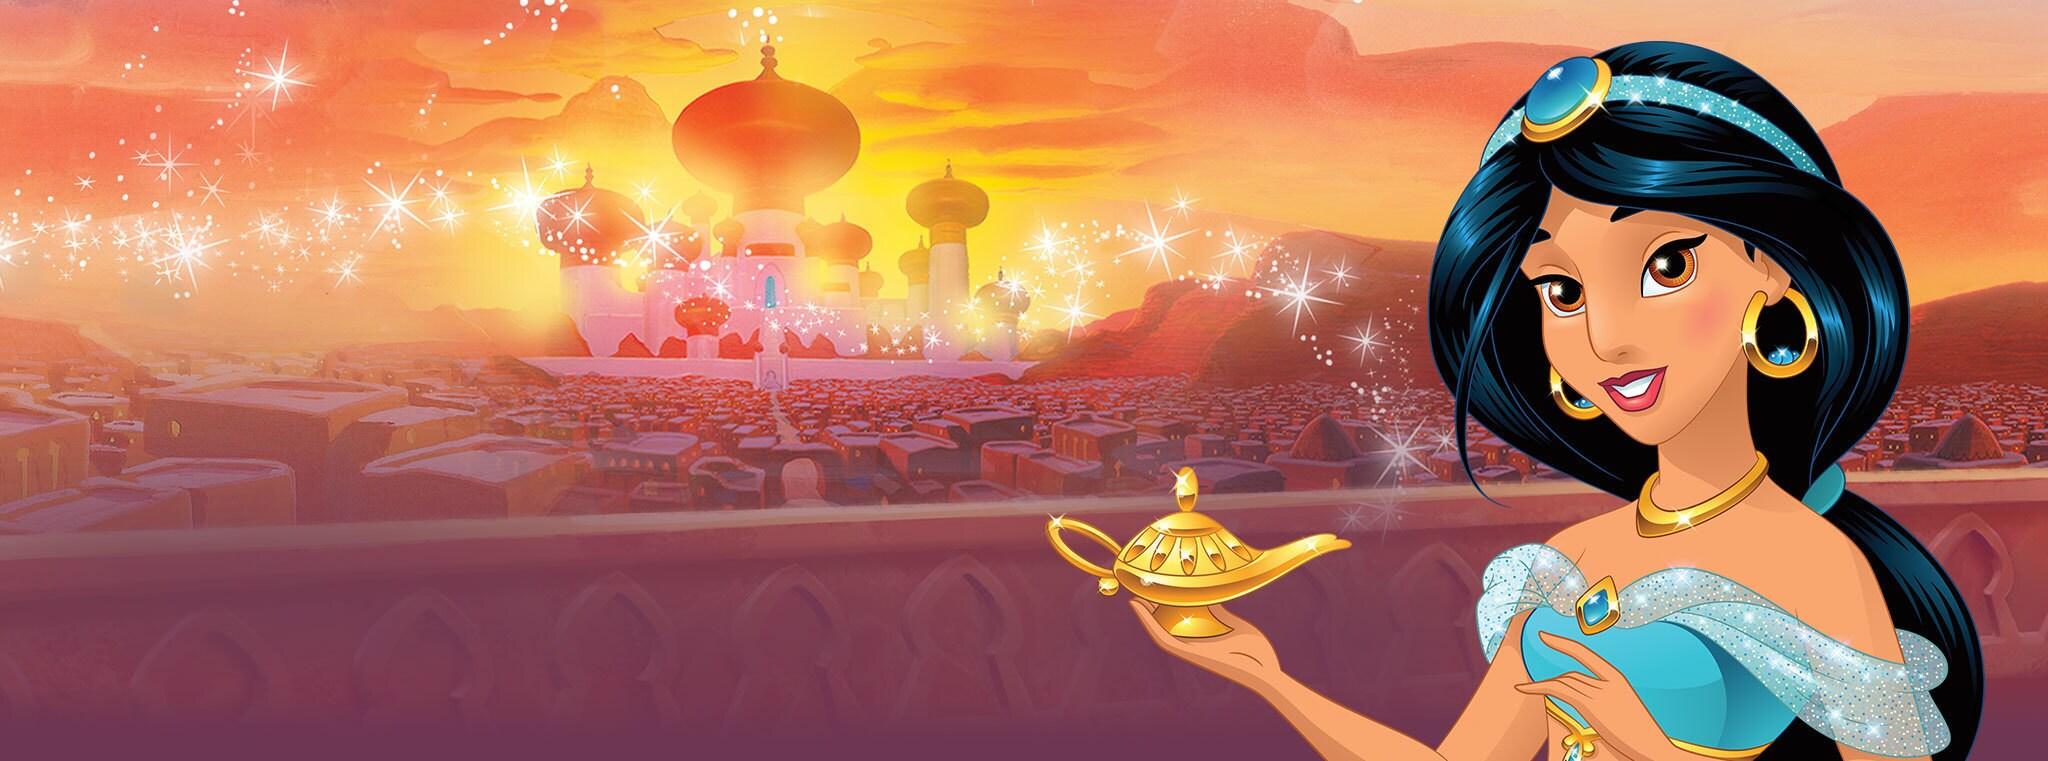 Jasmine Games & Videos - Aladdin - Disney Princess UK